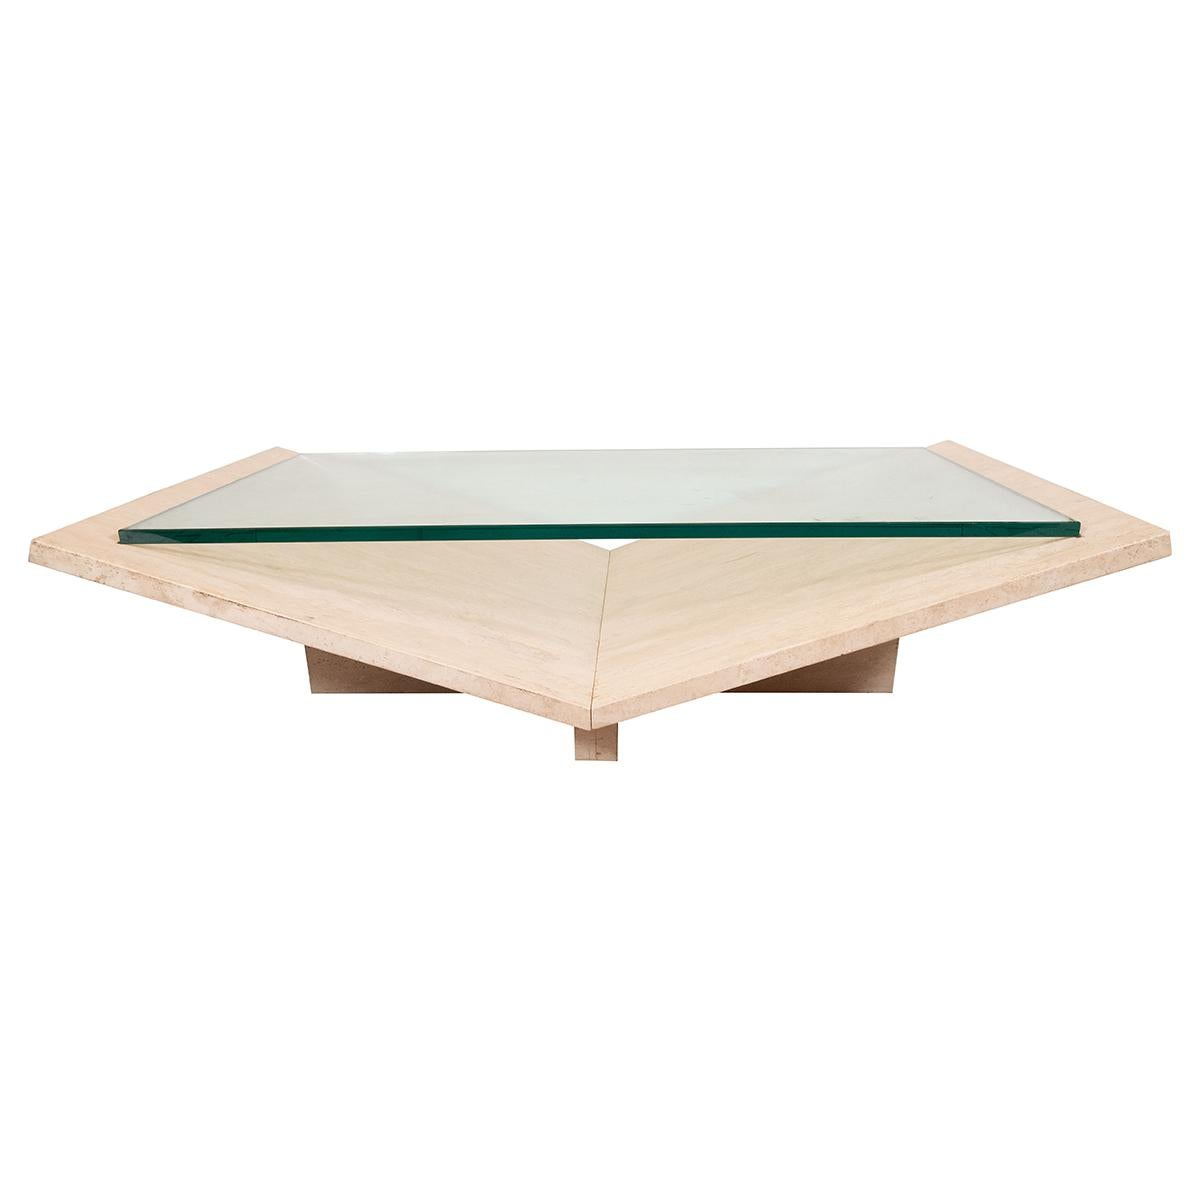 Sculptural Travertine Coffee Table